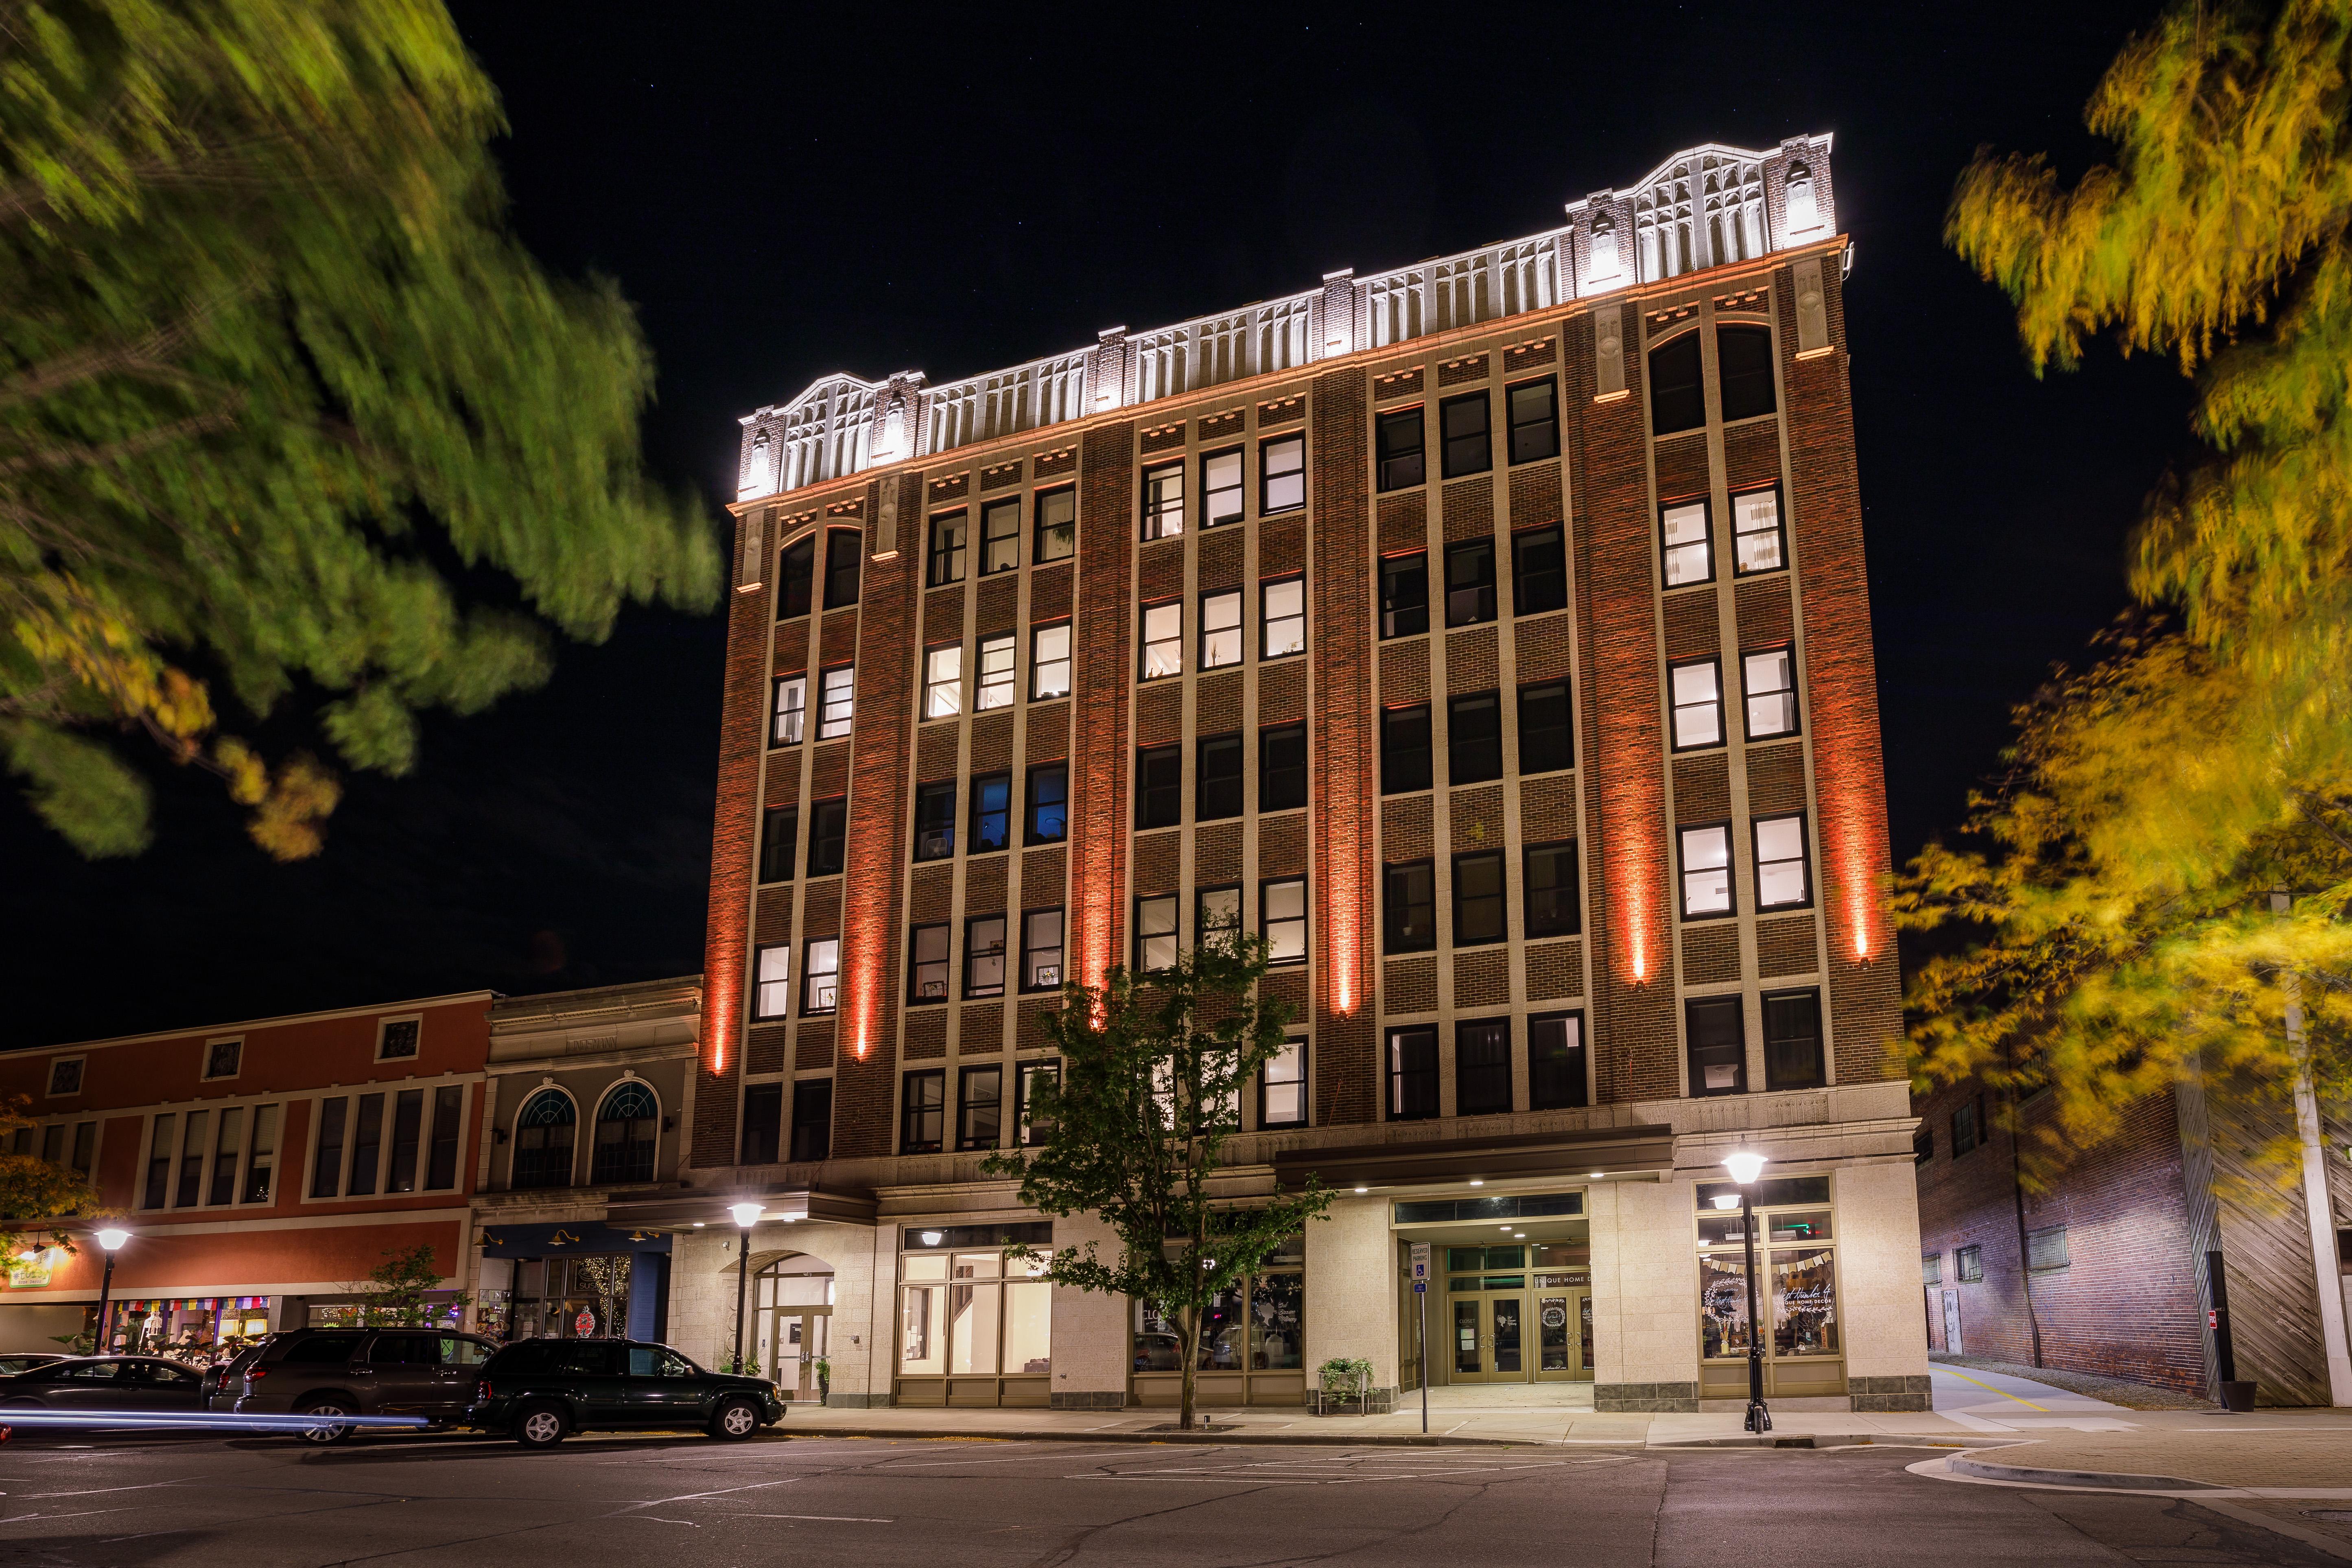 Michigan City Uptown Artist Lofts – KIL Architecture